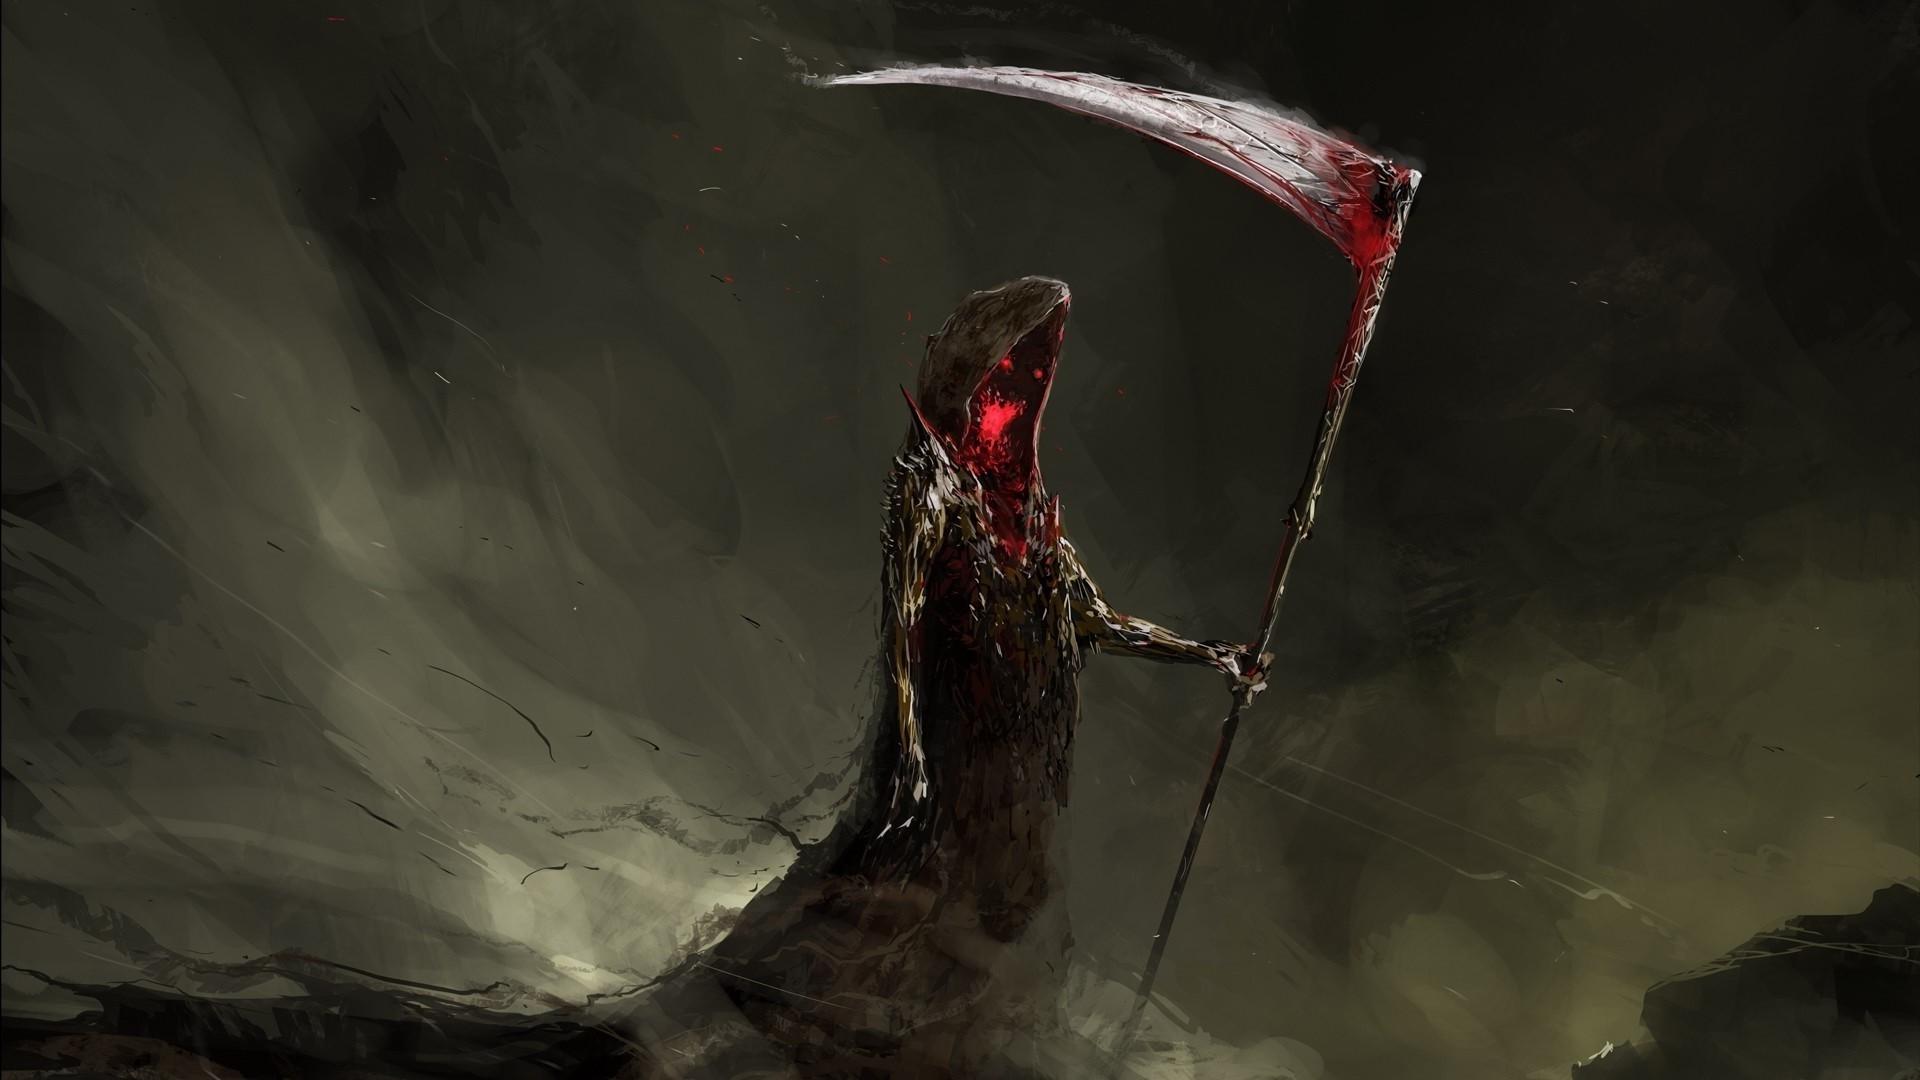 Drawn scythe darkness Dark Digital Drawing Scythe Eyes